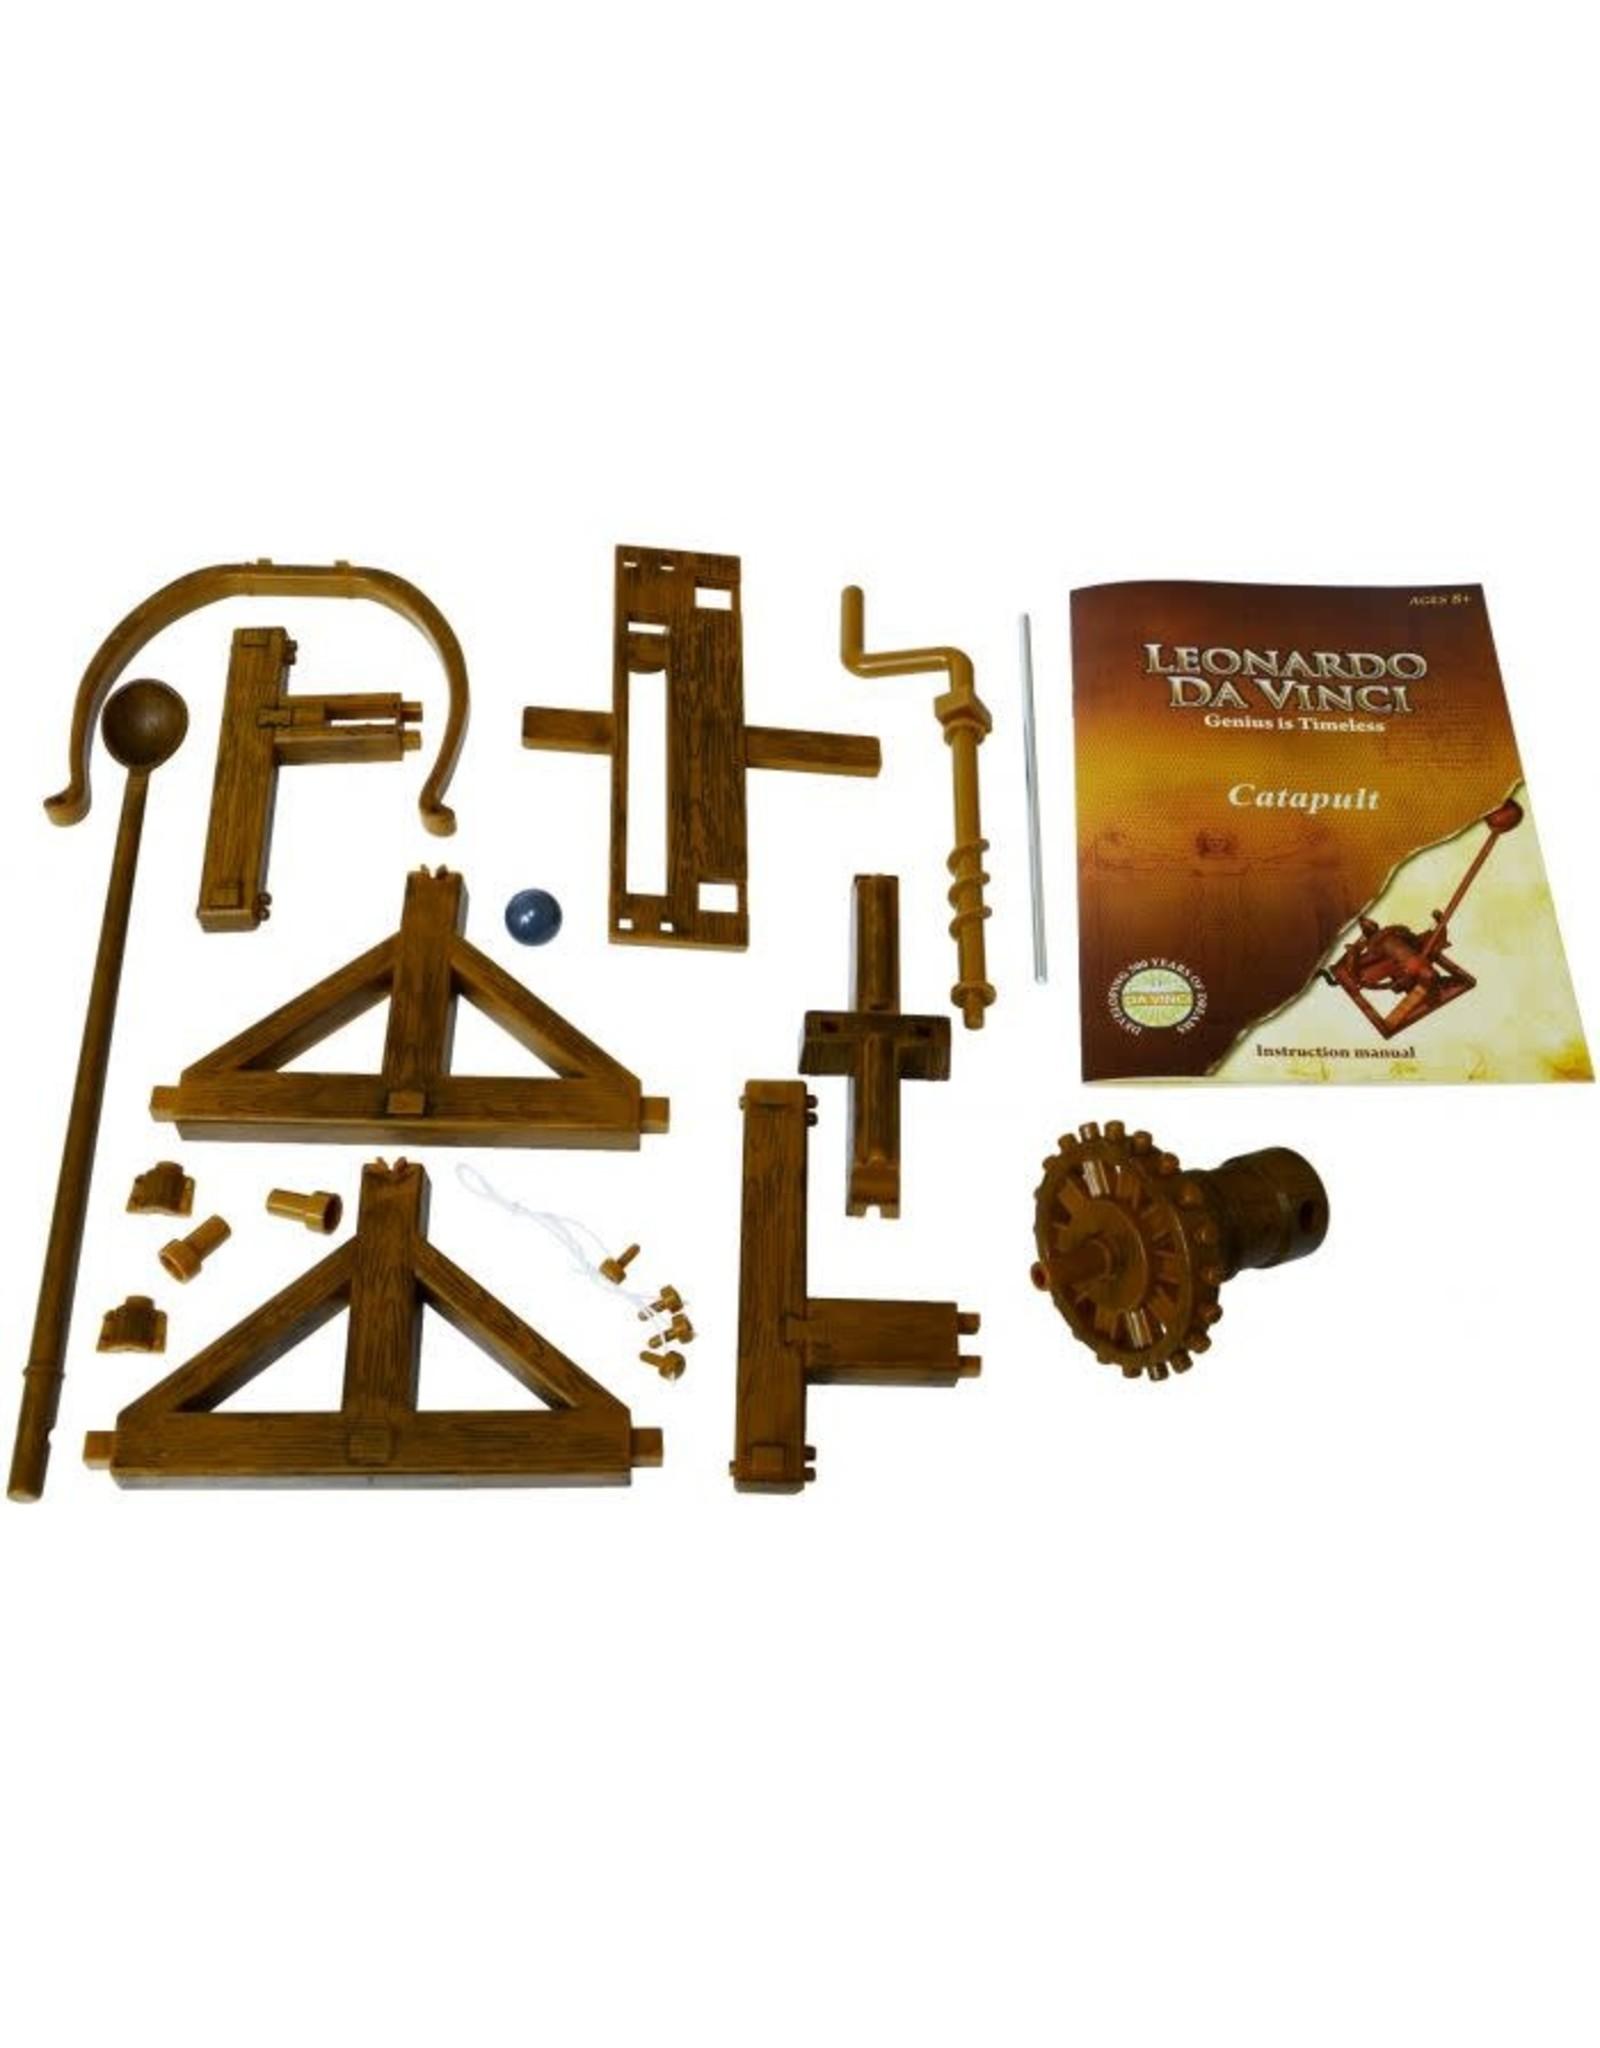 Leonardo Da Vinci Kits Catapult